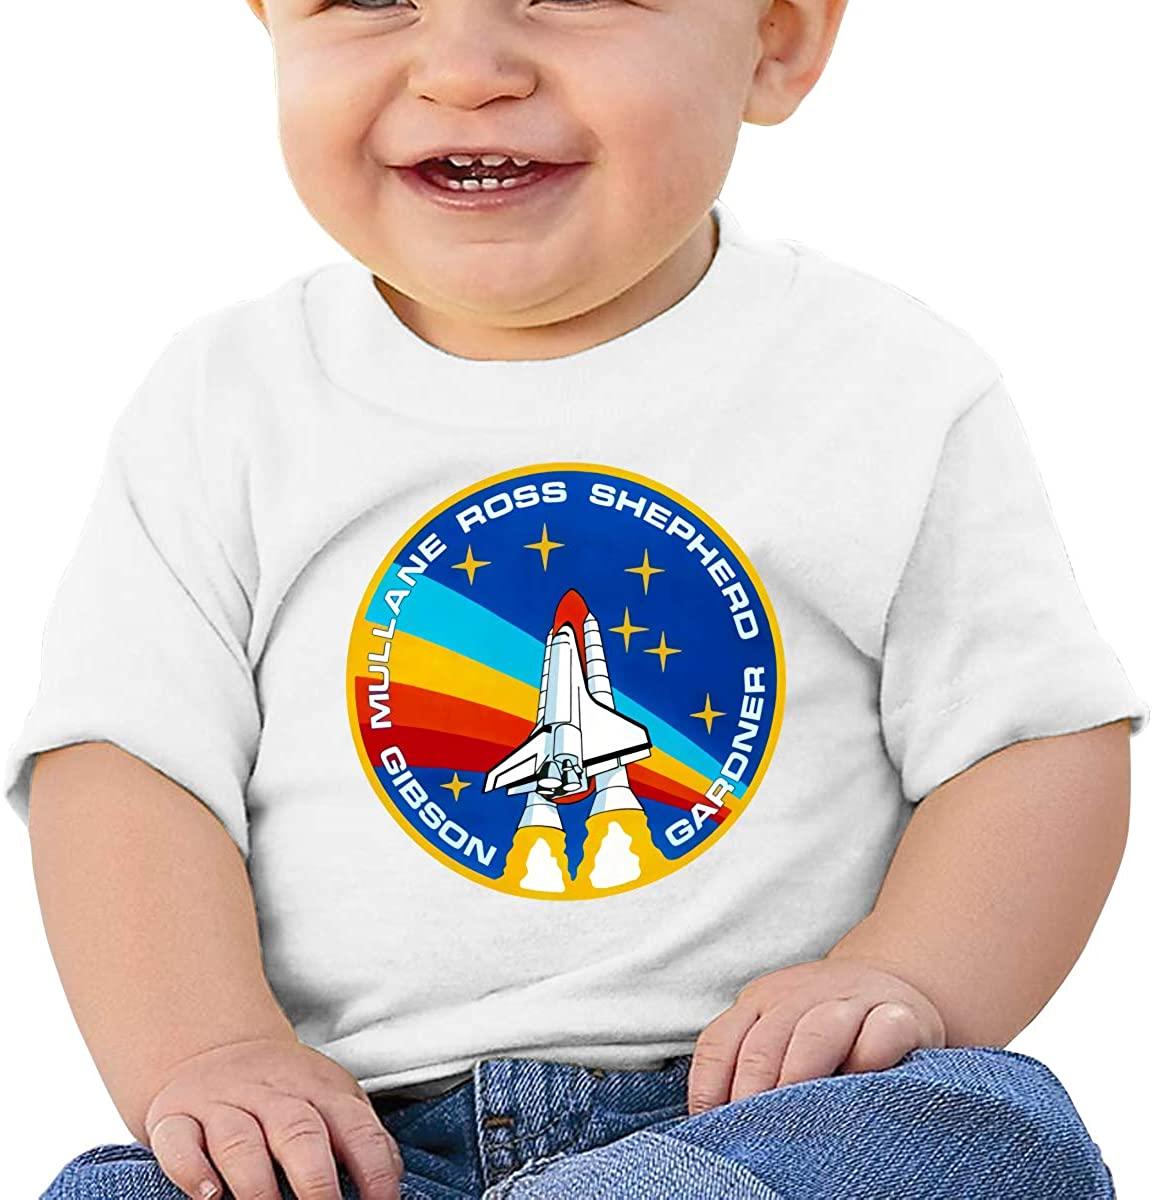 Gbyuhjbujhhjnuj Baby T-Shirt Cute Infant Home NASA Graphic Toddler T Boys and Girls Soft Short Sleeve Cotton Kids Shirt